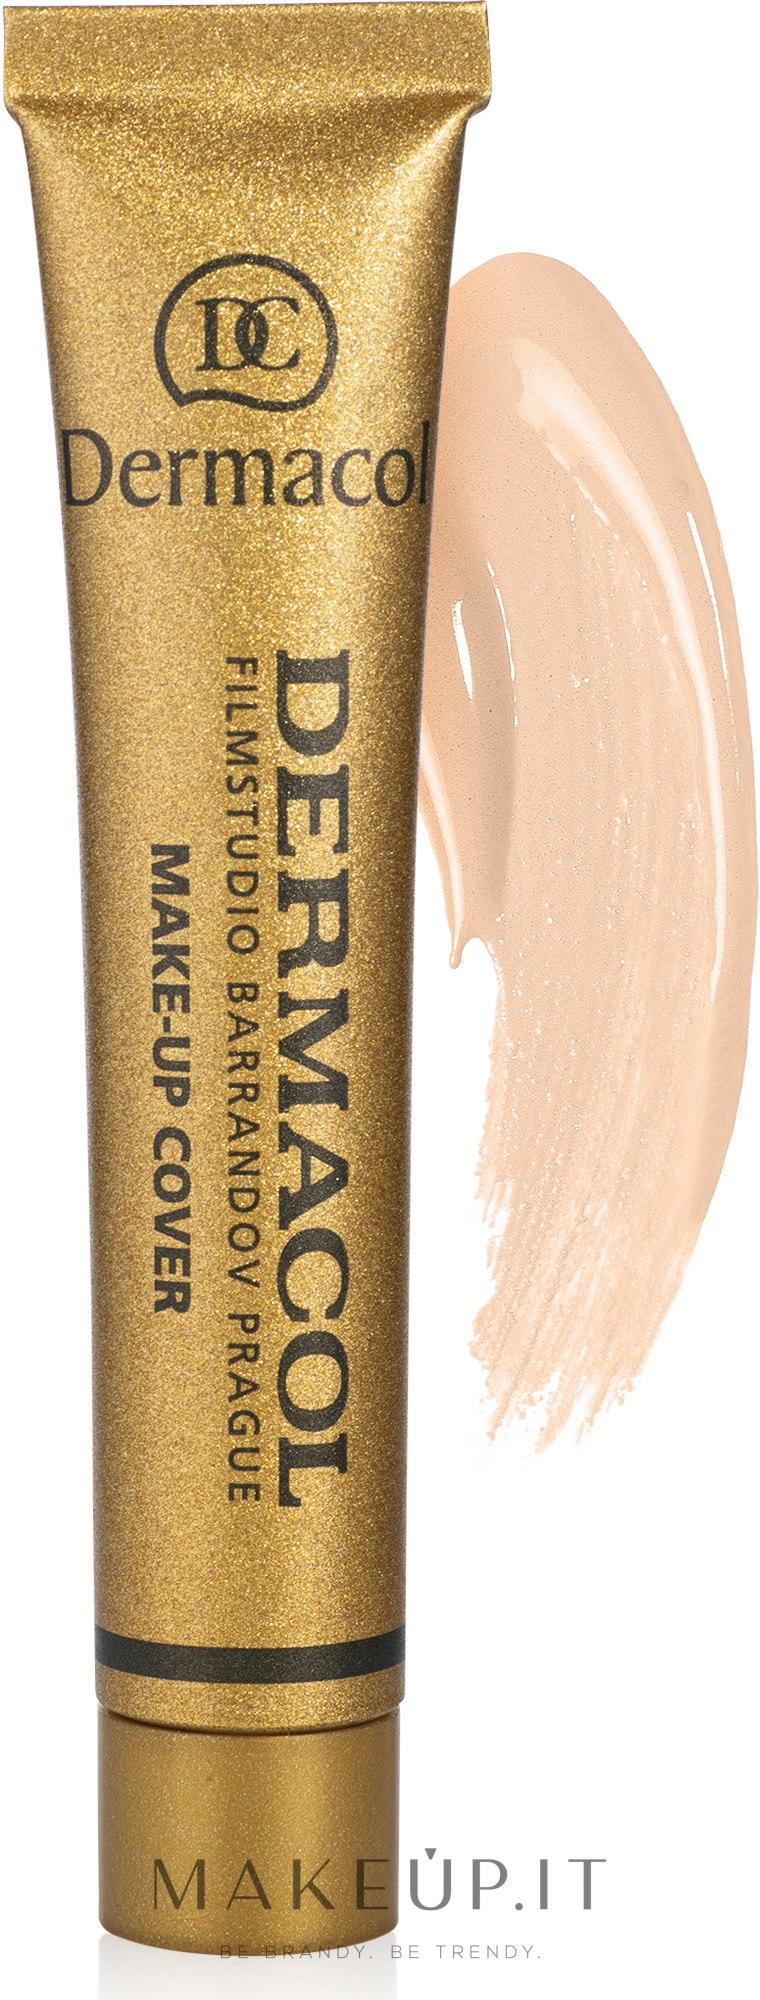 Fondotinta opaco per il viso - Dermacol Make-Up Cover — foto 207